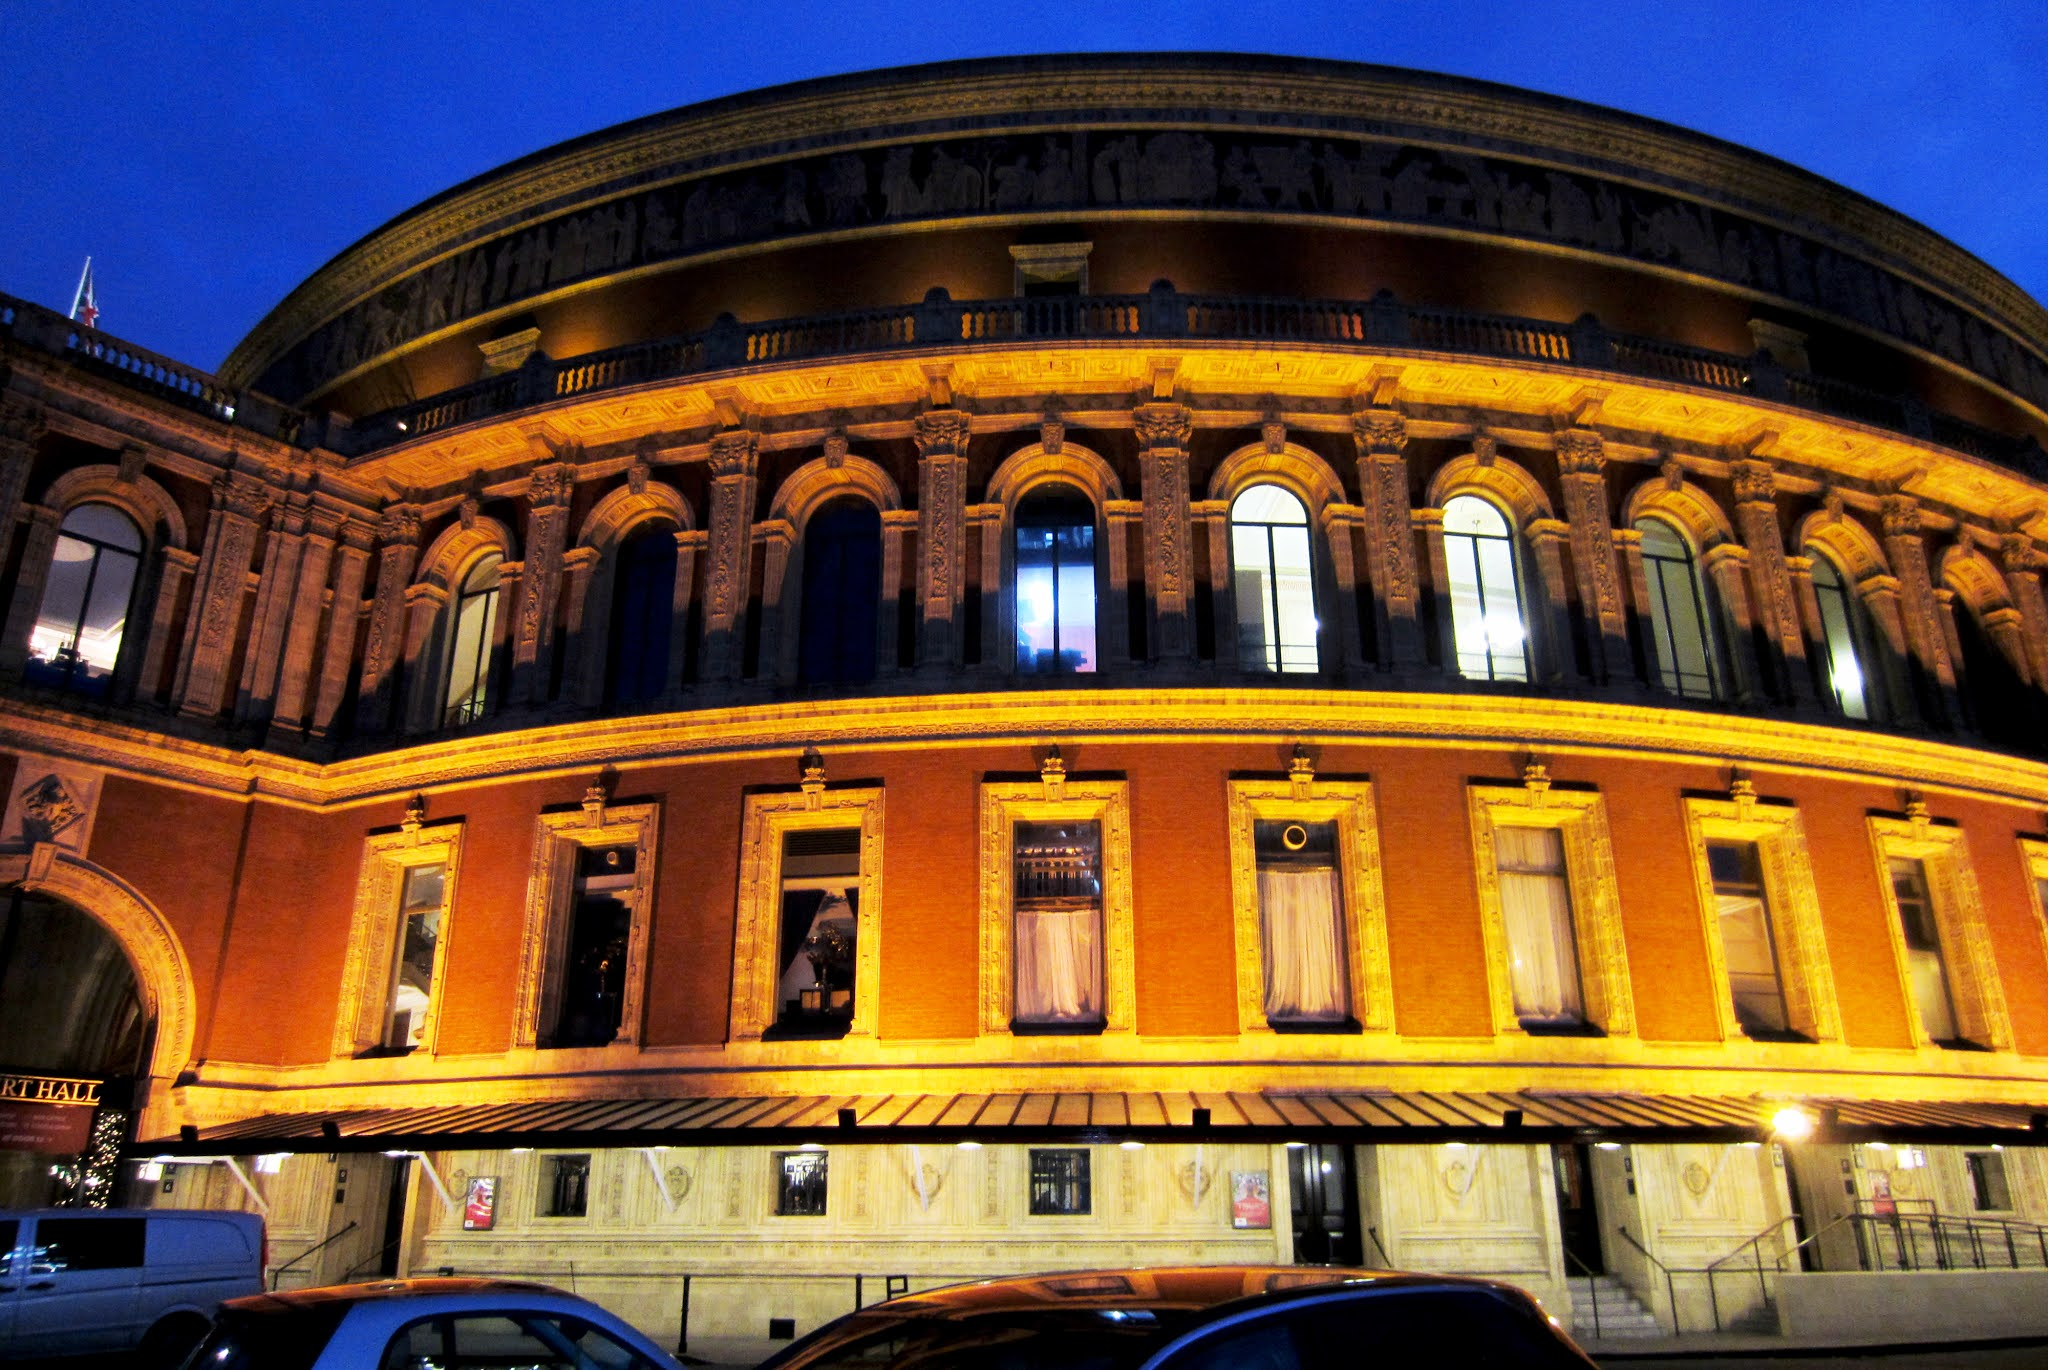 Royal Albert Hall exterior